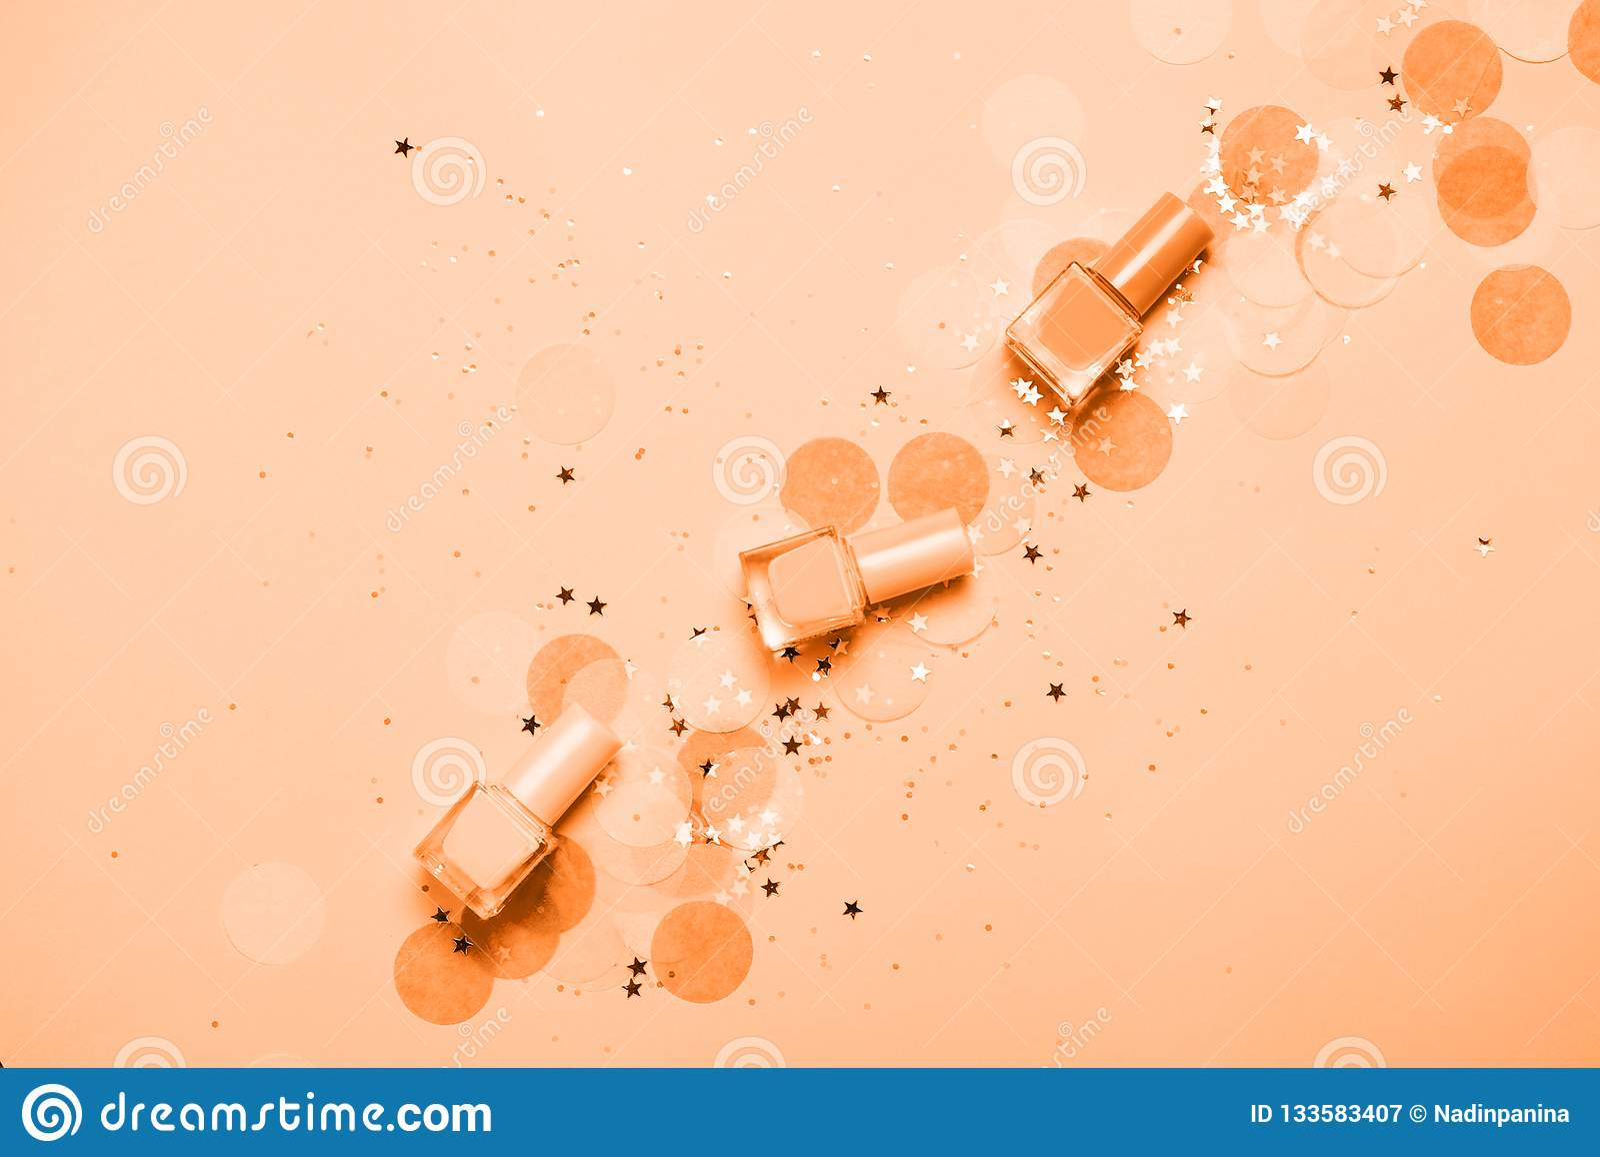 Russet πορτοκαλί στιλβωτικές ουσίες και κομφετί καρφιών κρητιδογραφιών, αστέρια και σπινθηρίσματα